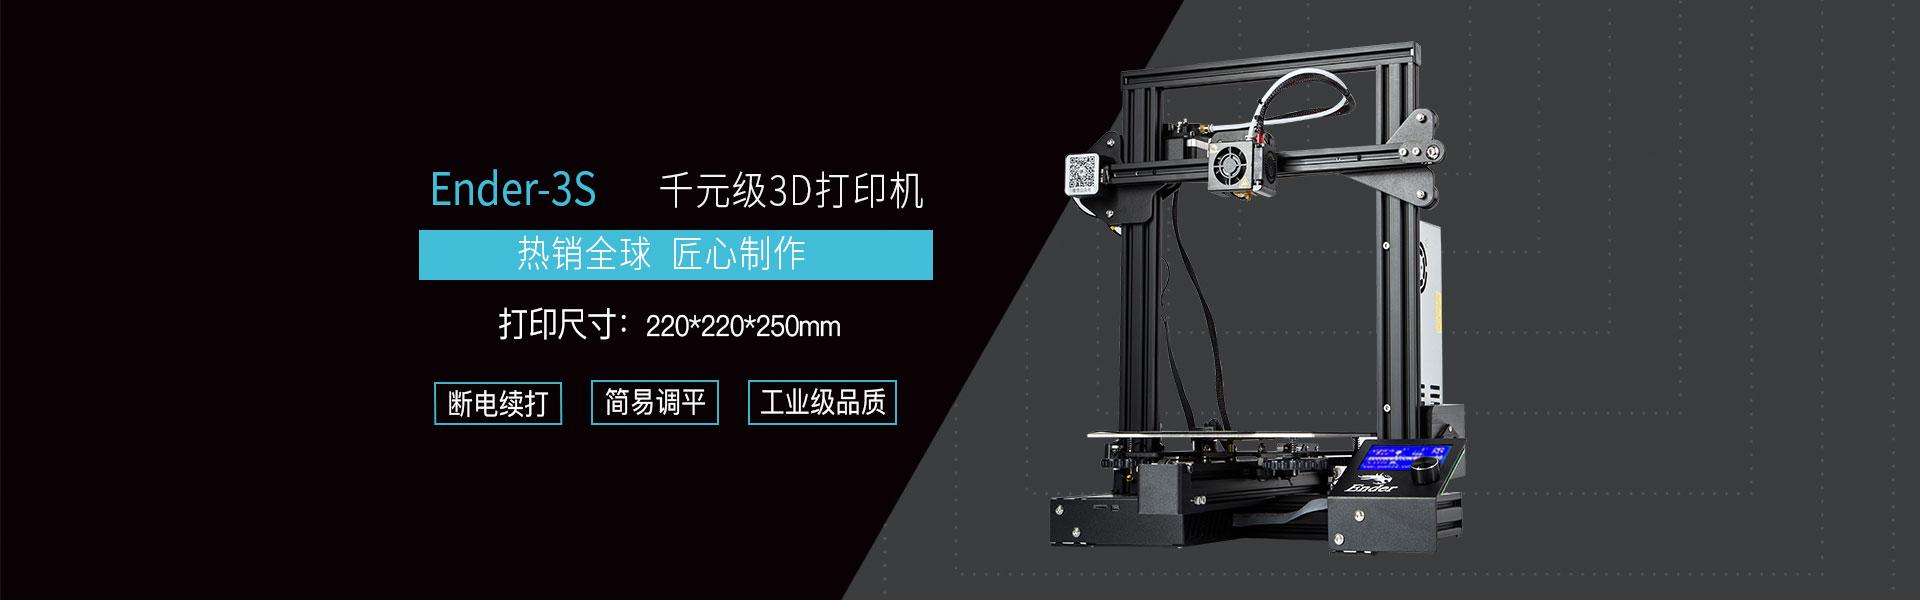 3D打印机ENDER-3S